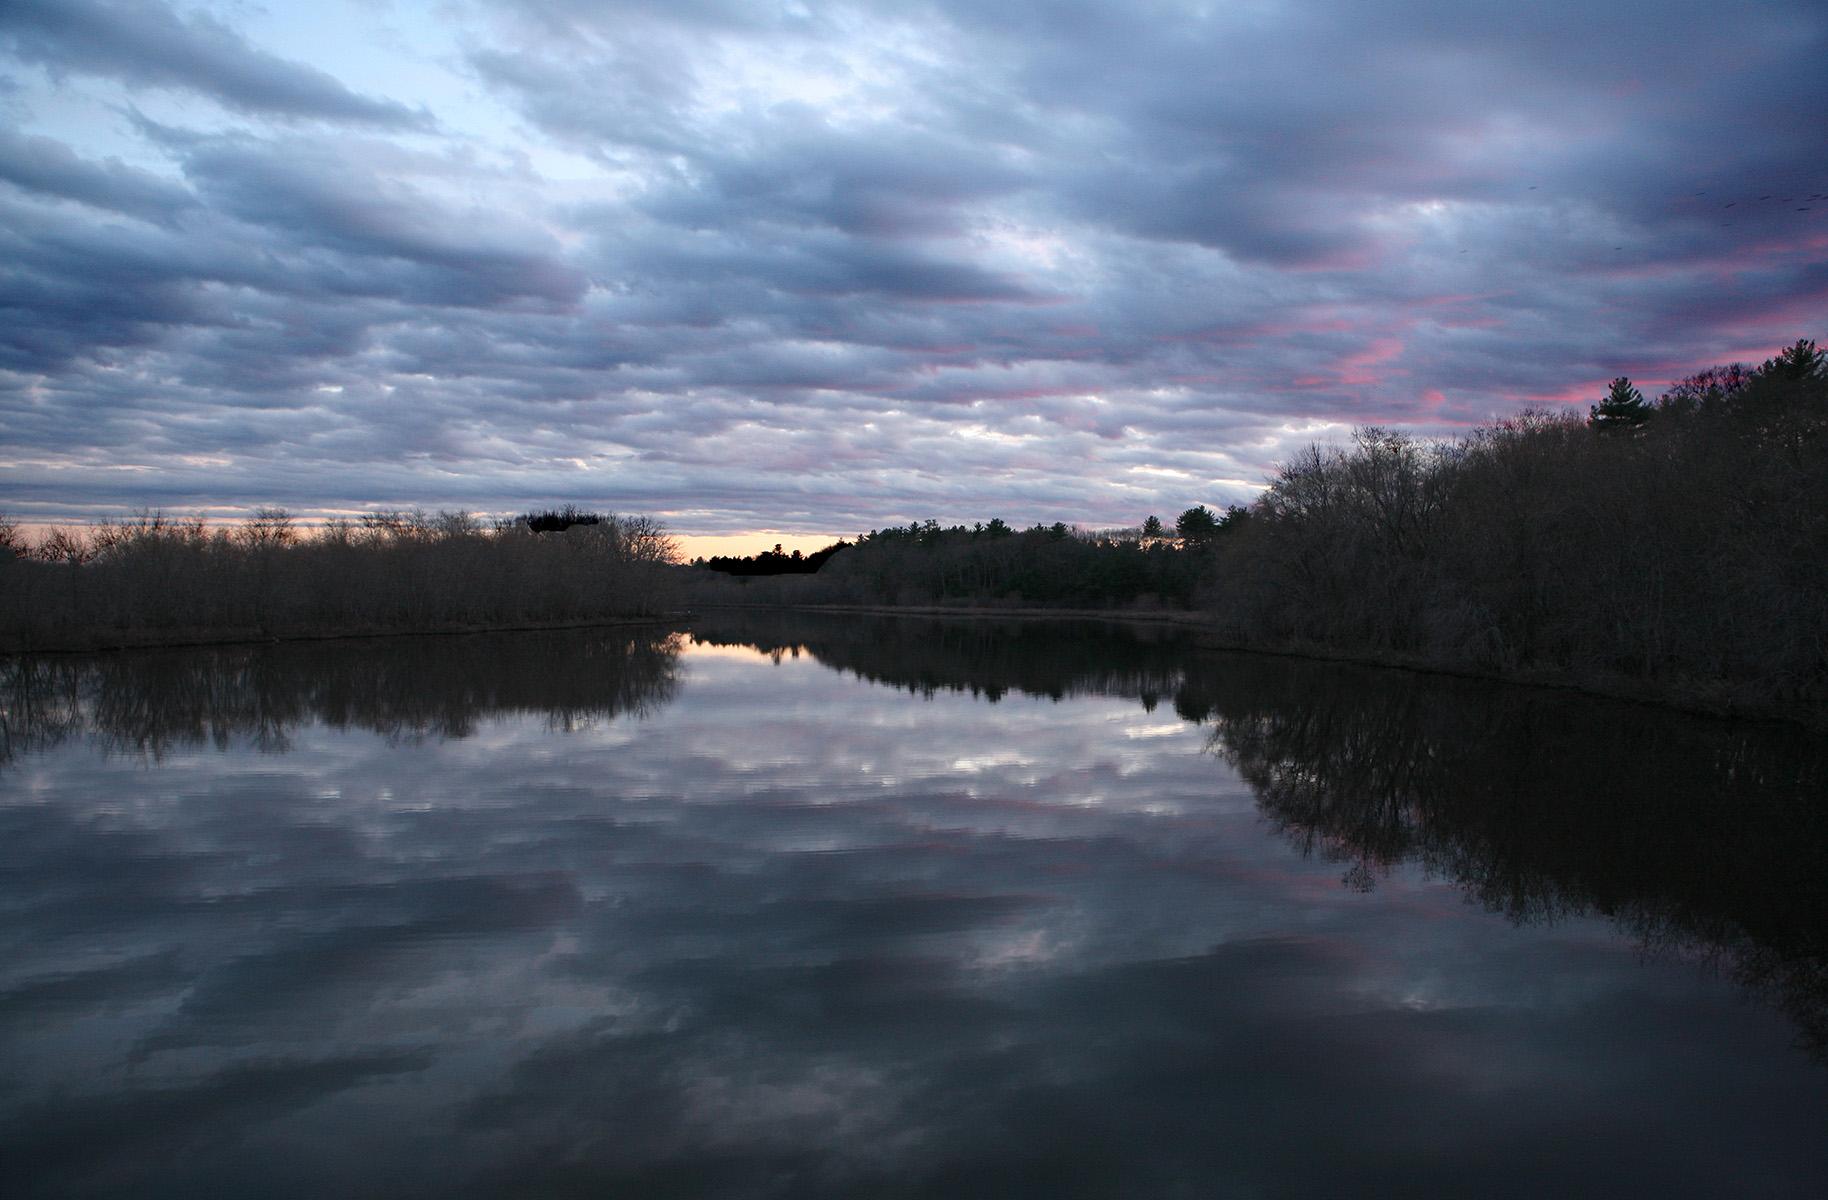 Sudbury River at Dusk